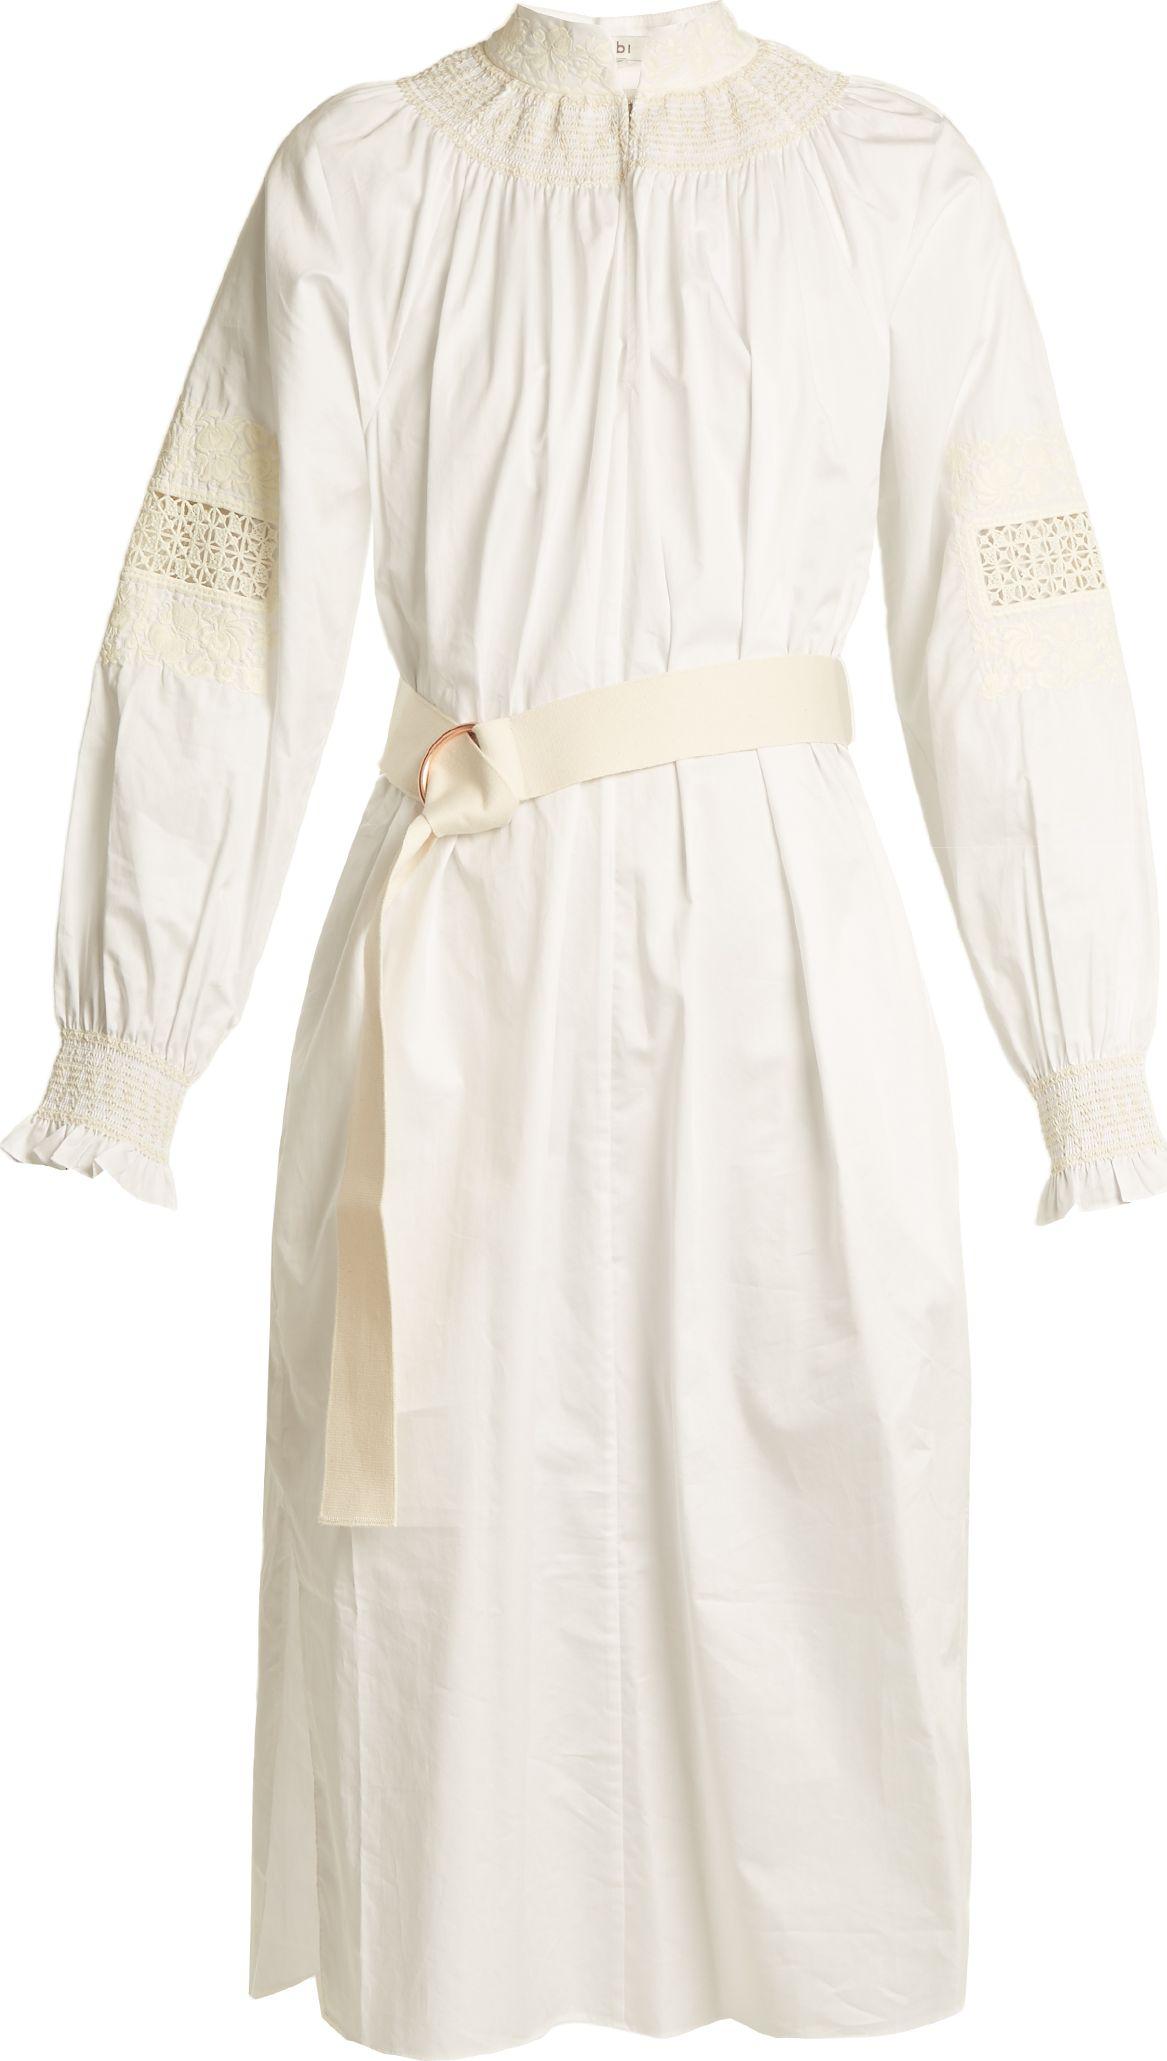 Tibi - Cora embroidered cotton dress